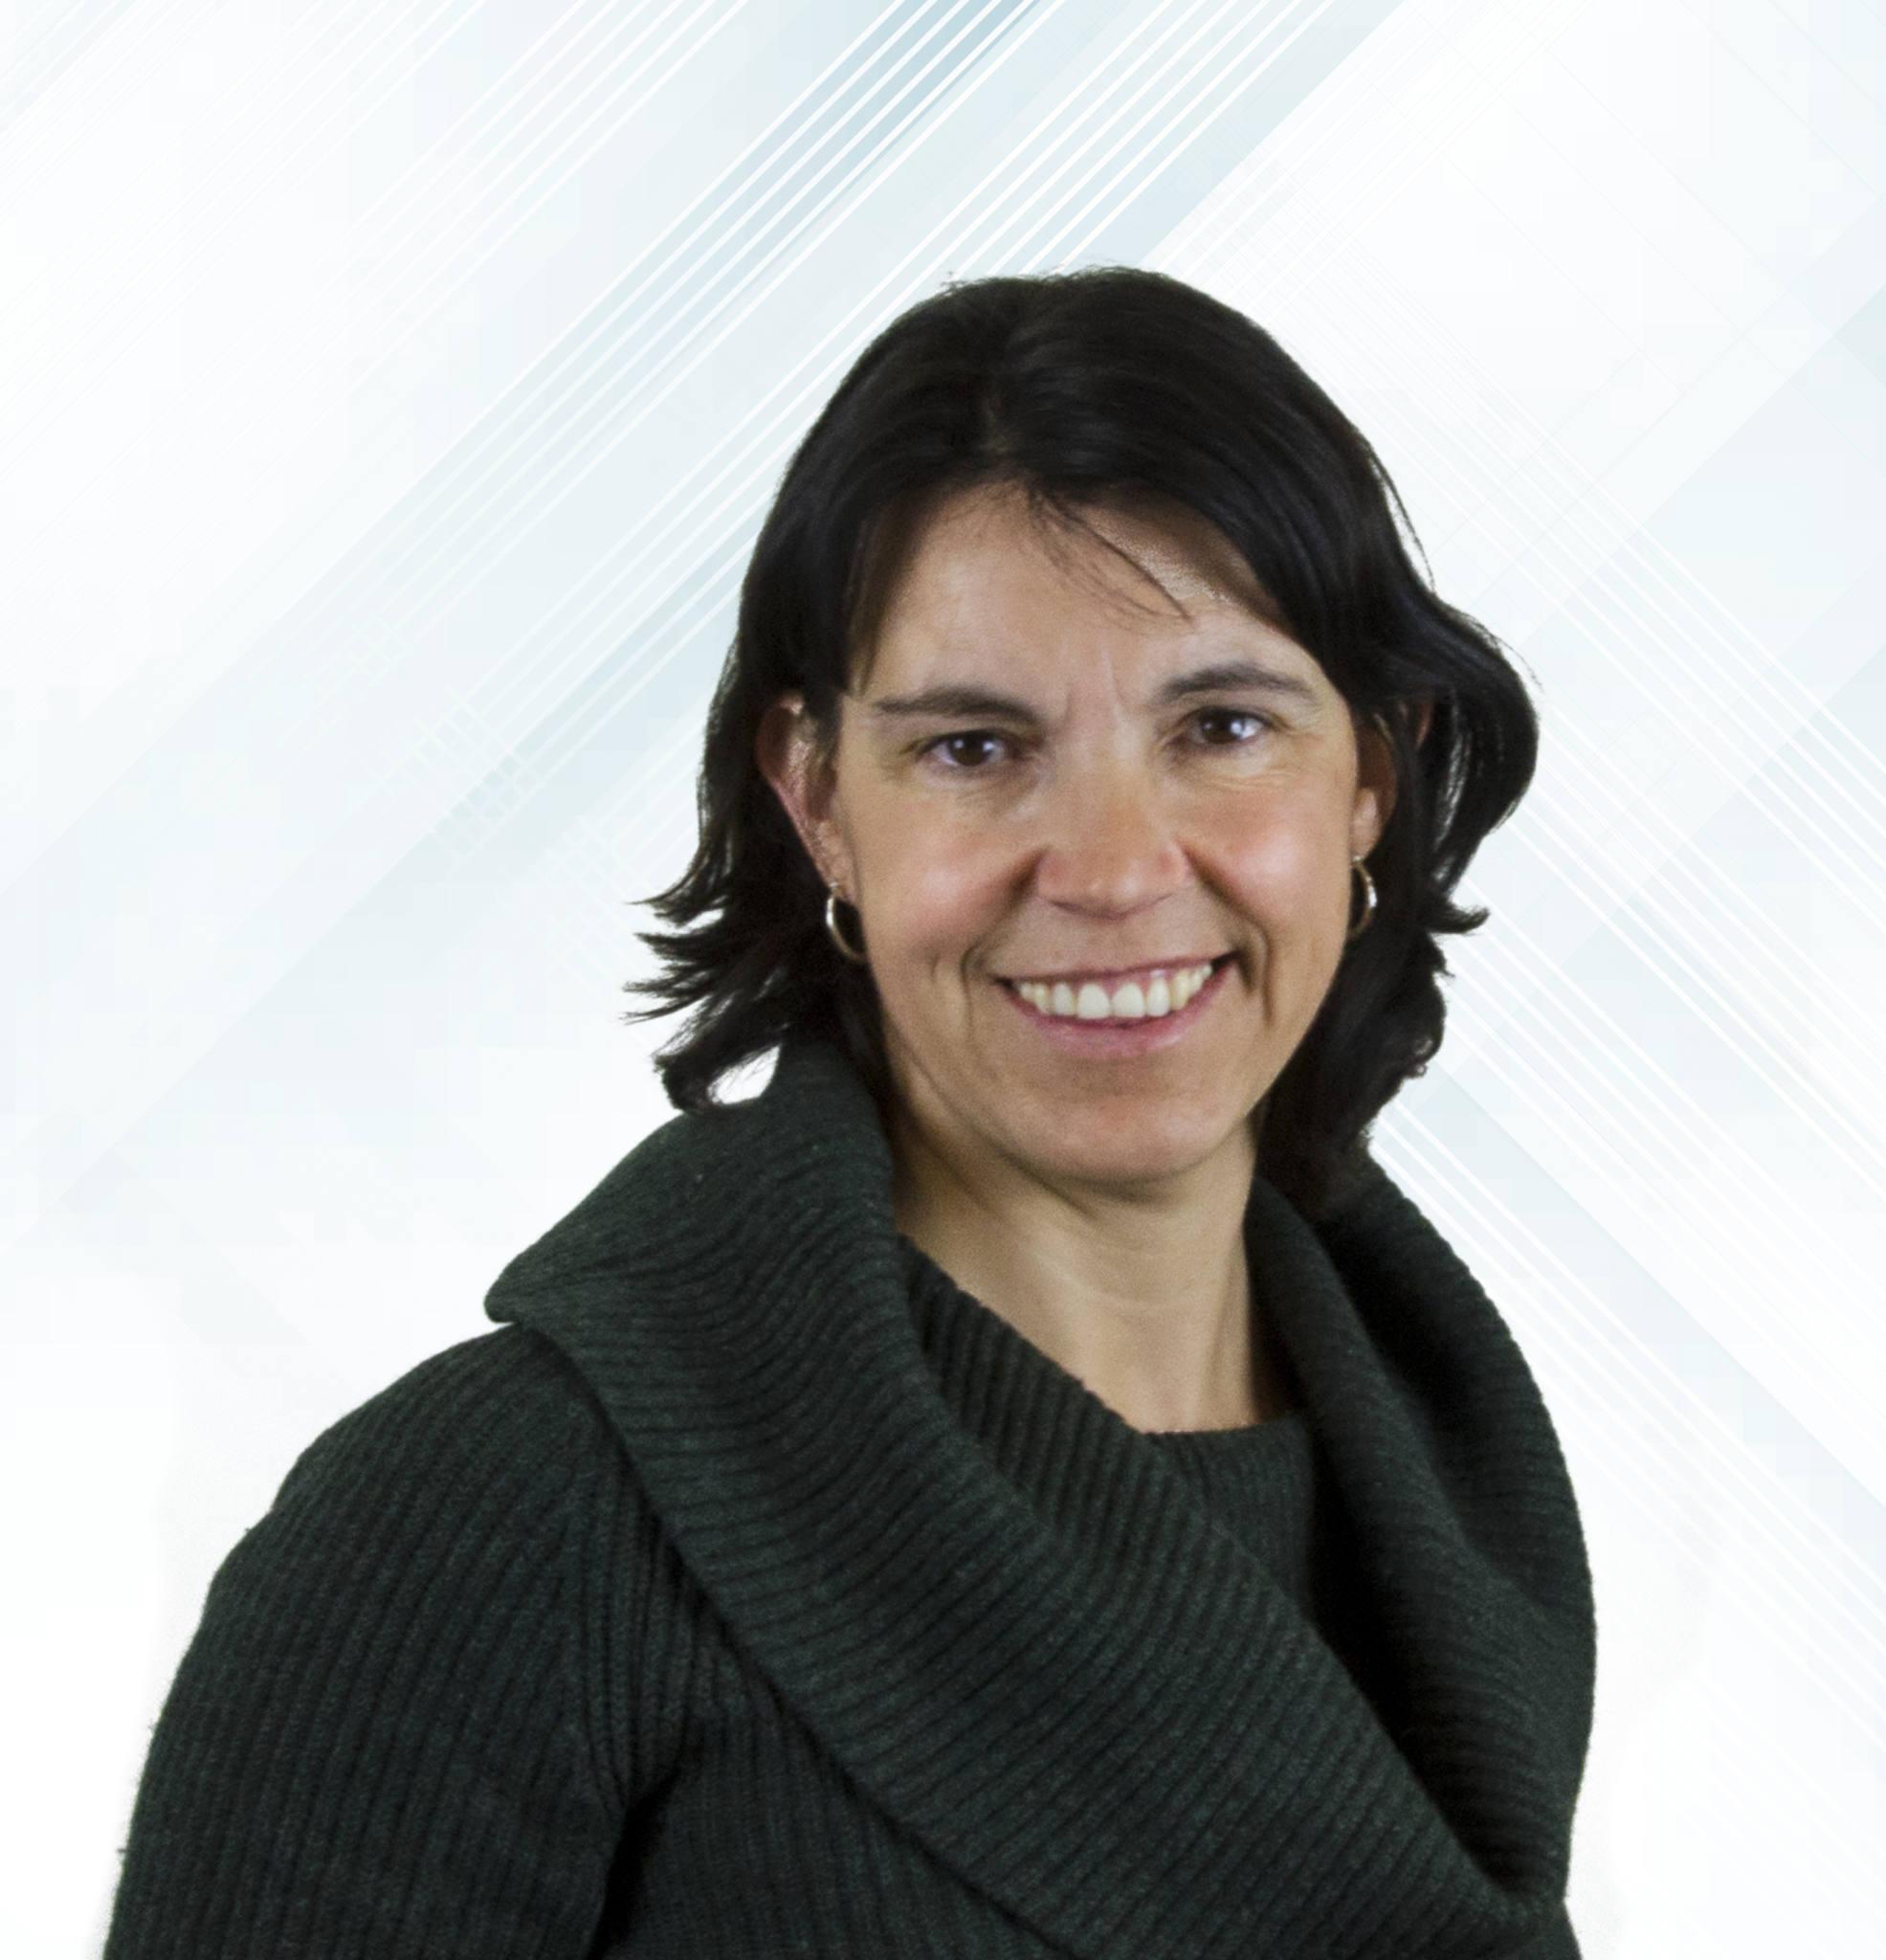 Bárbara Ondiviela EIZAGUIRRE